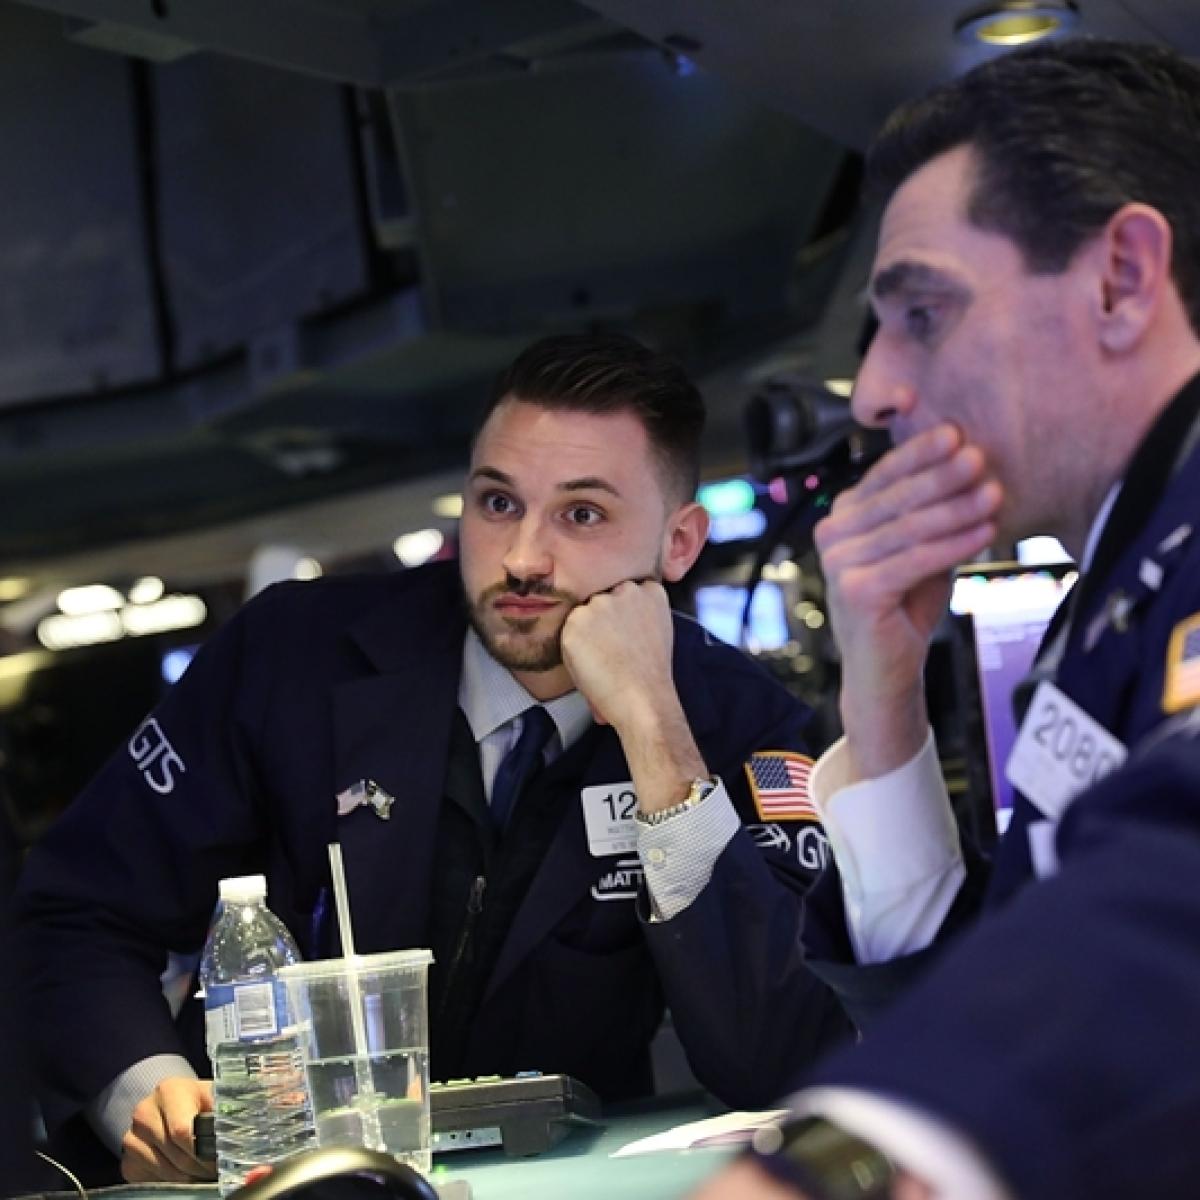 BofA cuts March quarter growth forecast to 4%